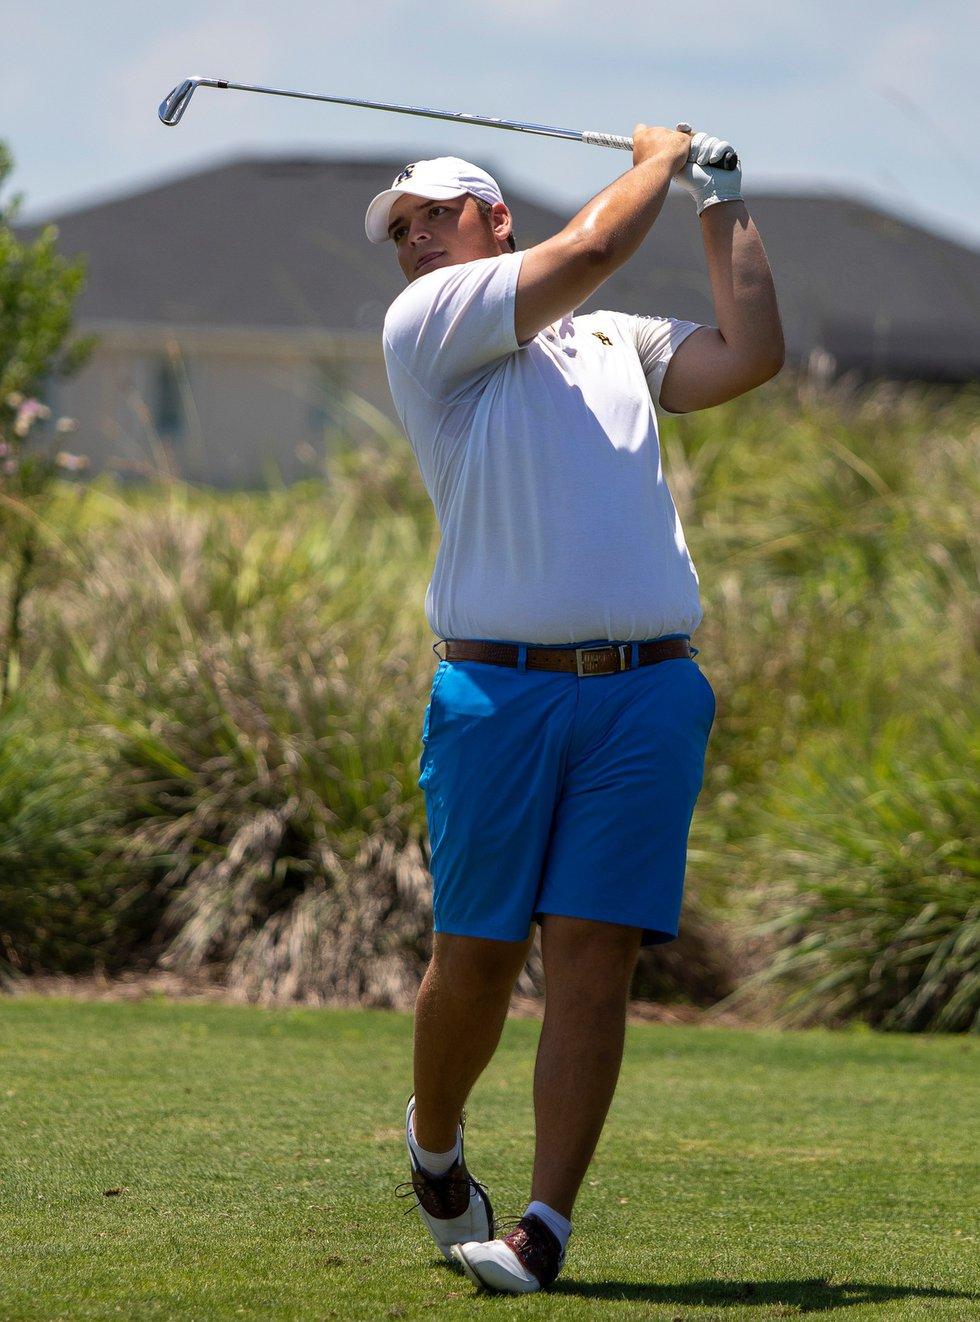 Owen Burt in action at the 2019 NJCAA golf national championship at Duran Golf Club.